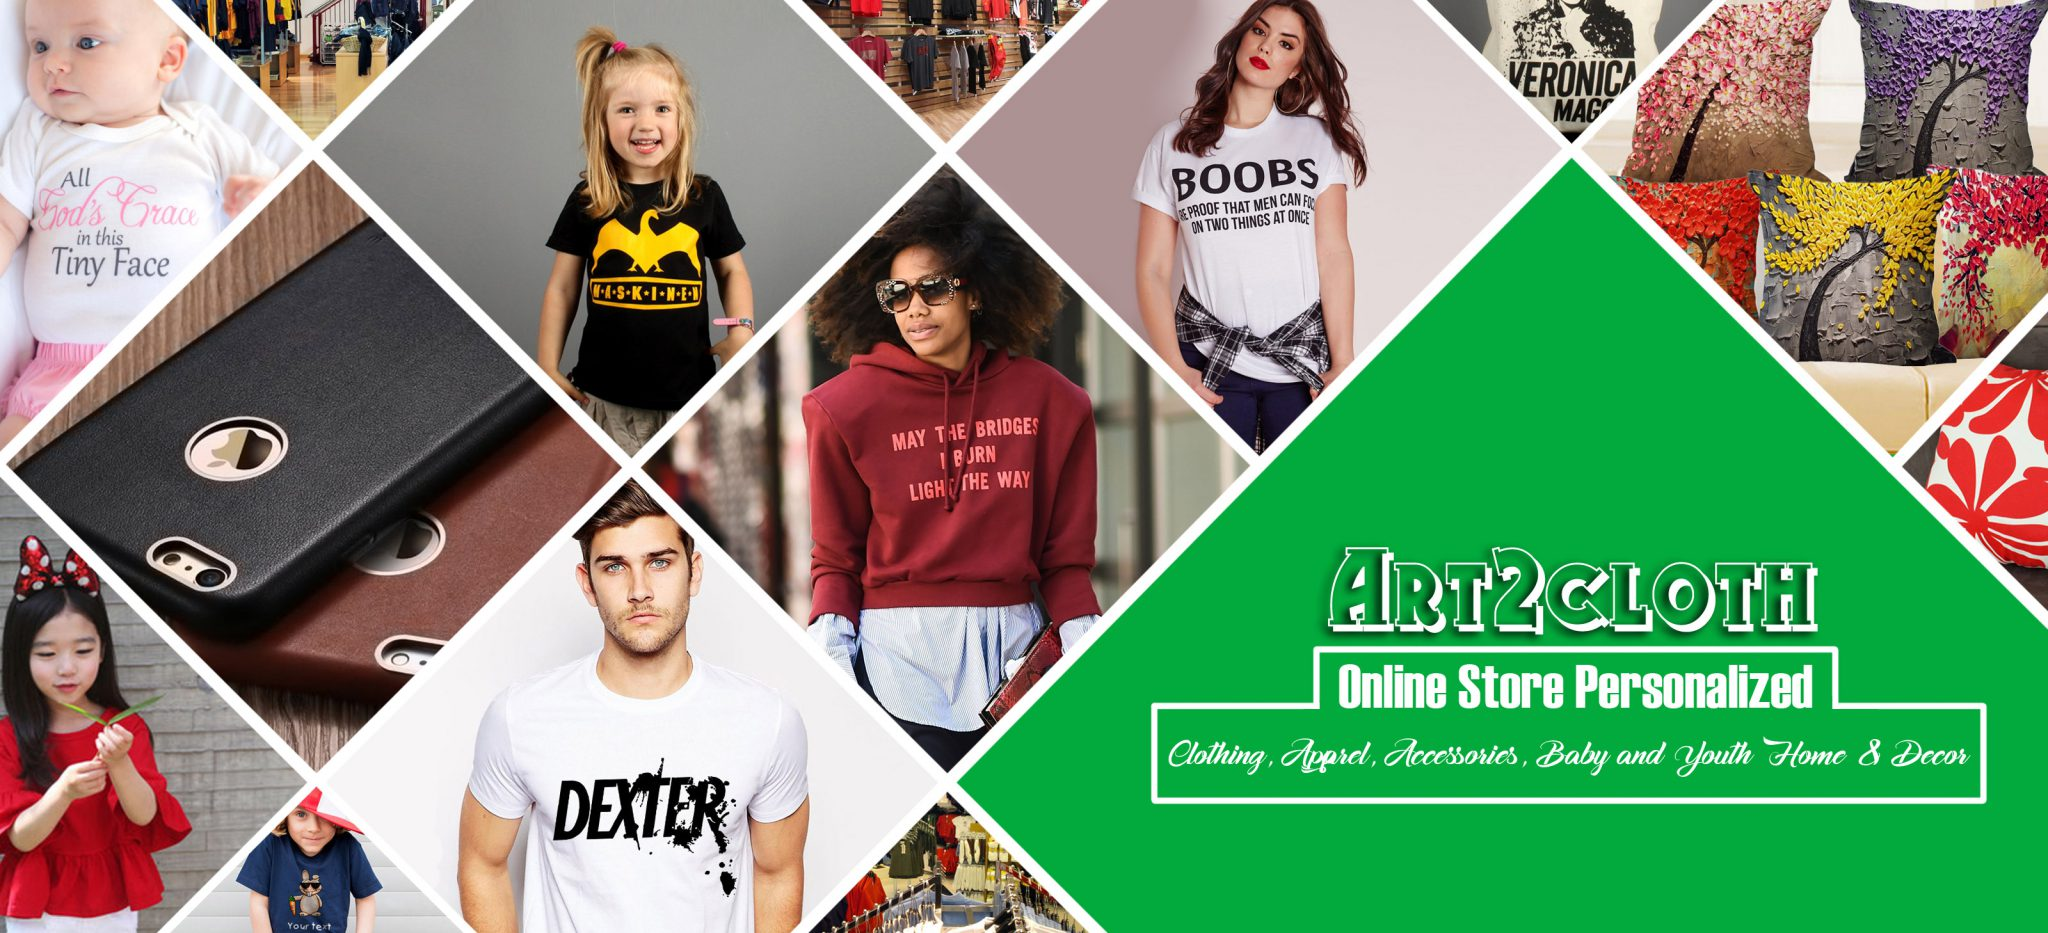 67792d627 Art2cloth is Cheap Custom Design Such us T-Shirt, Tank Top, Sweatshirt,  Hoodies, Mug, Baby Bodysuite, Kids T-Shirt, Pillow Case, Bags and Anything  Cheap ...